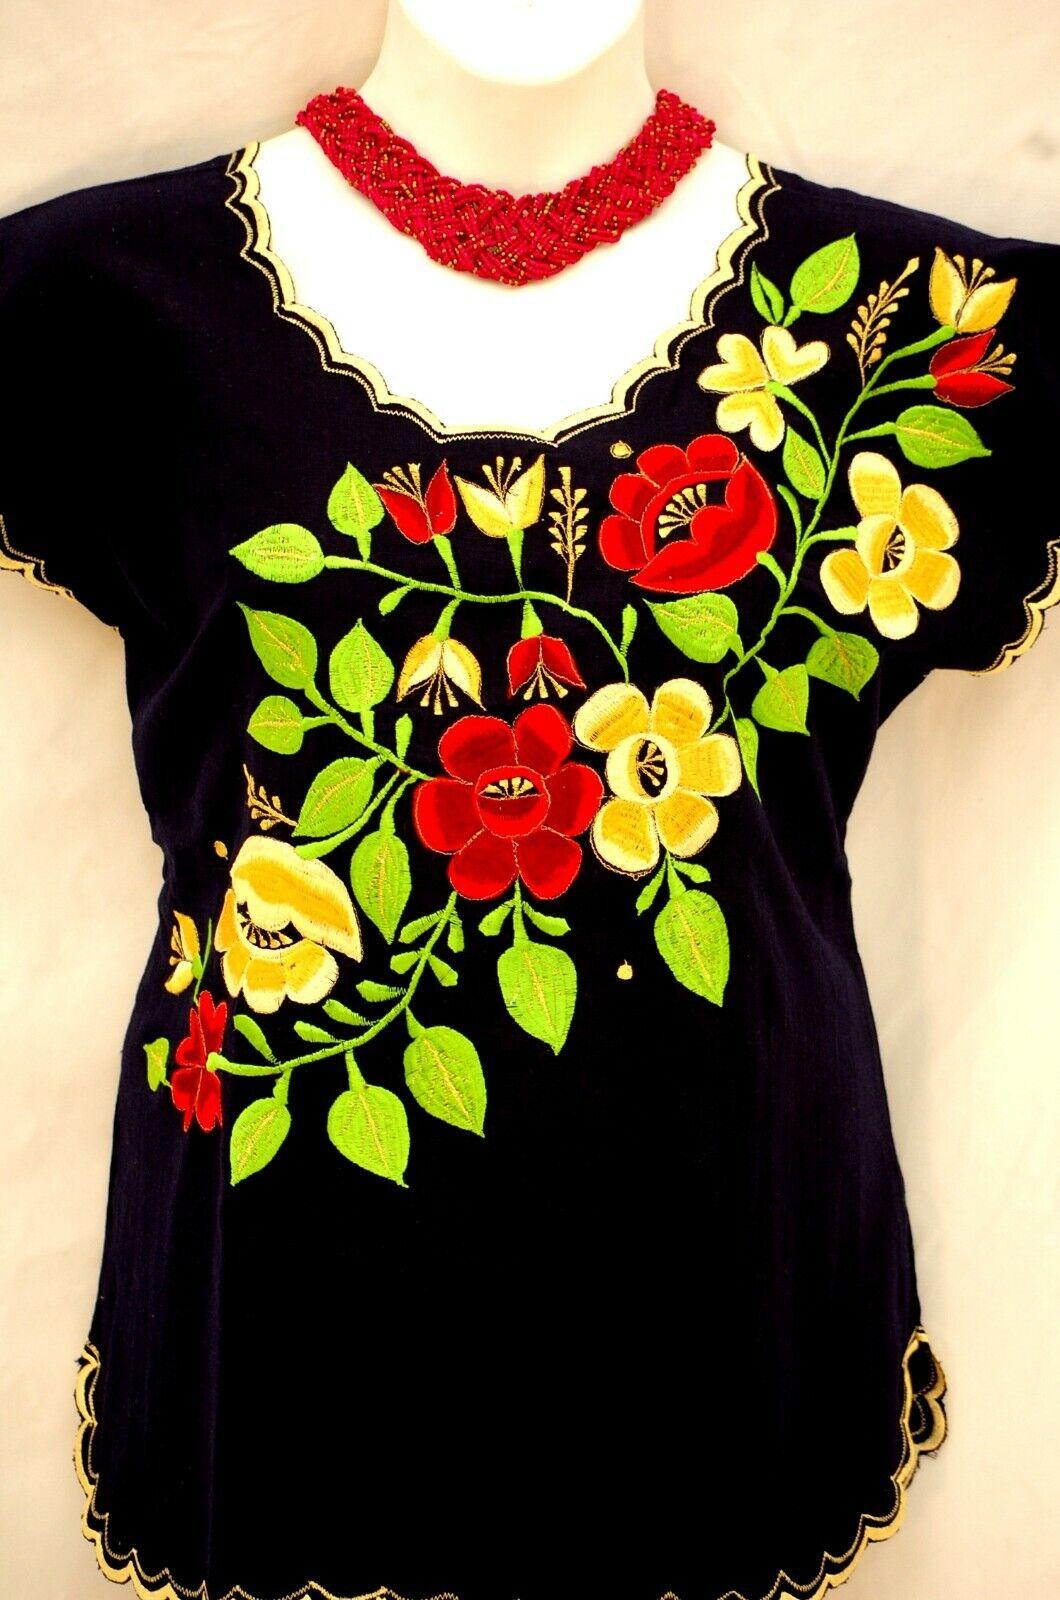 5 de Mayo Mexico Navy Blau Blouse Top linen Frida Big Floral Embroiderot Yucatan